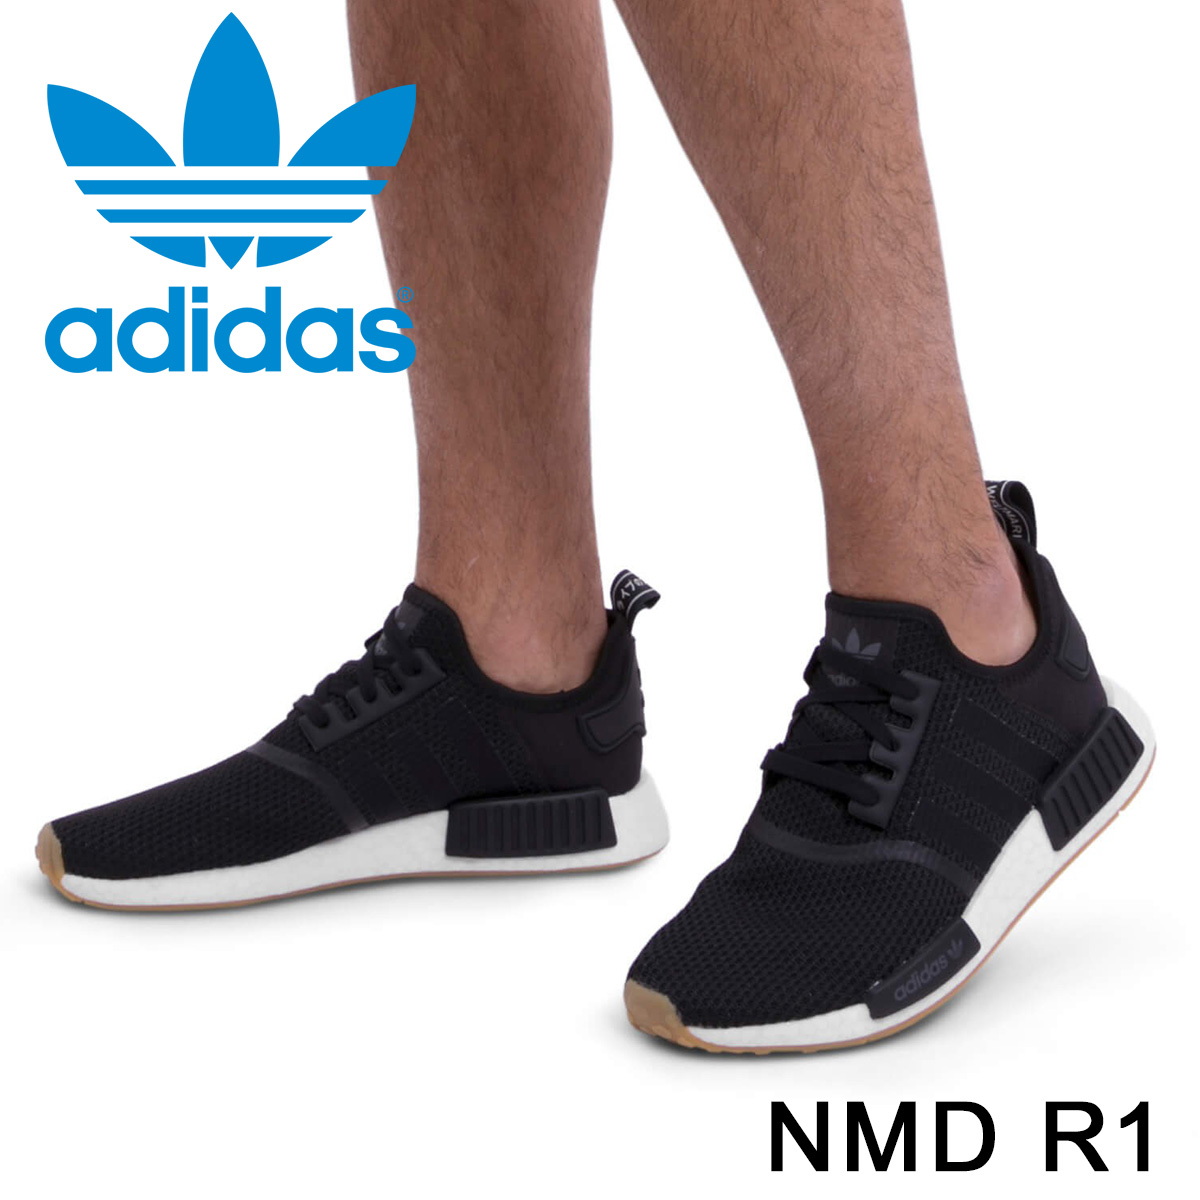 wholesale dealer af2d2 92b4b adidas Originals NMD R1 Adidas originals sneakers N M D nomad men B42200  black [7/7 Shinnyu load] [187]